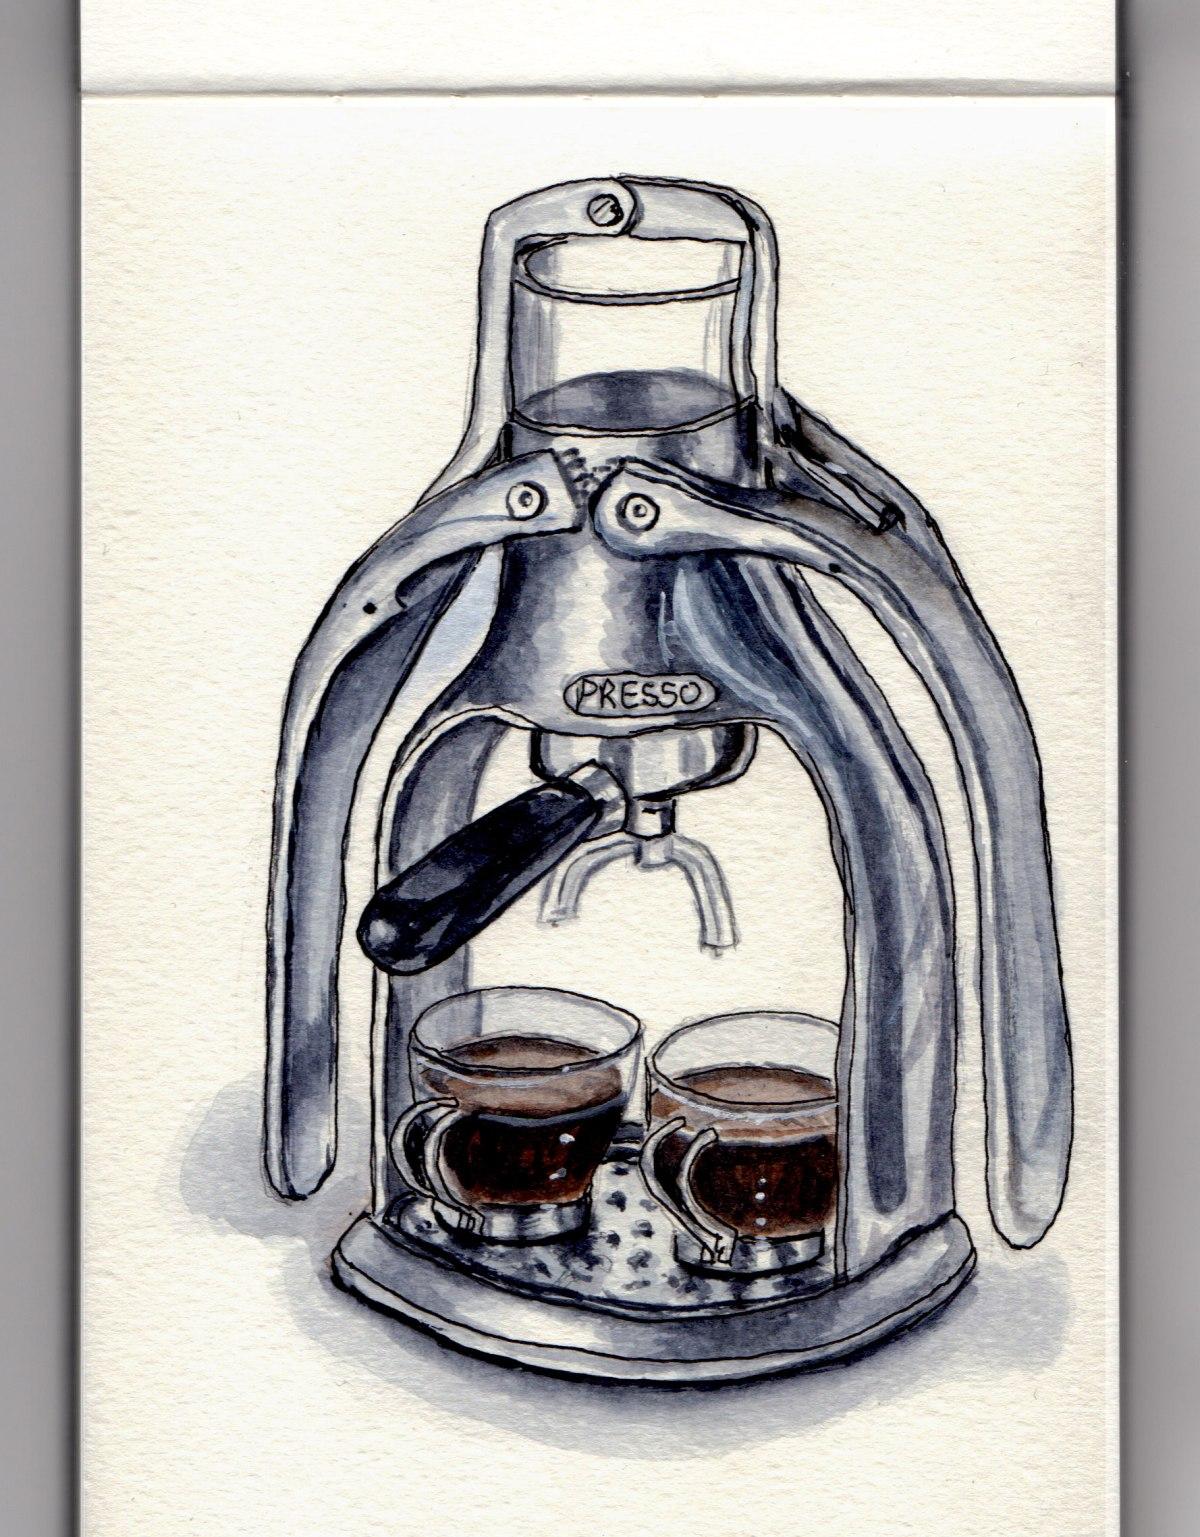 National Espresso Day - Presso Espresso Machine